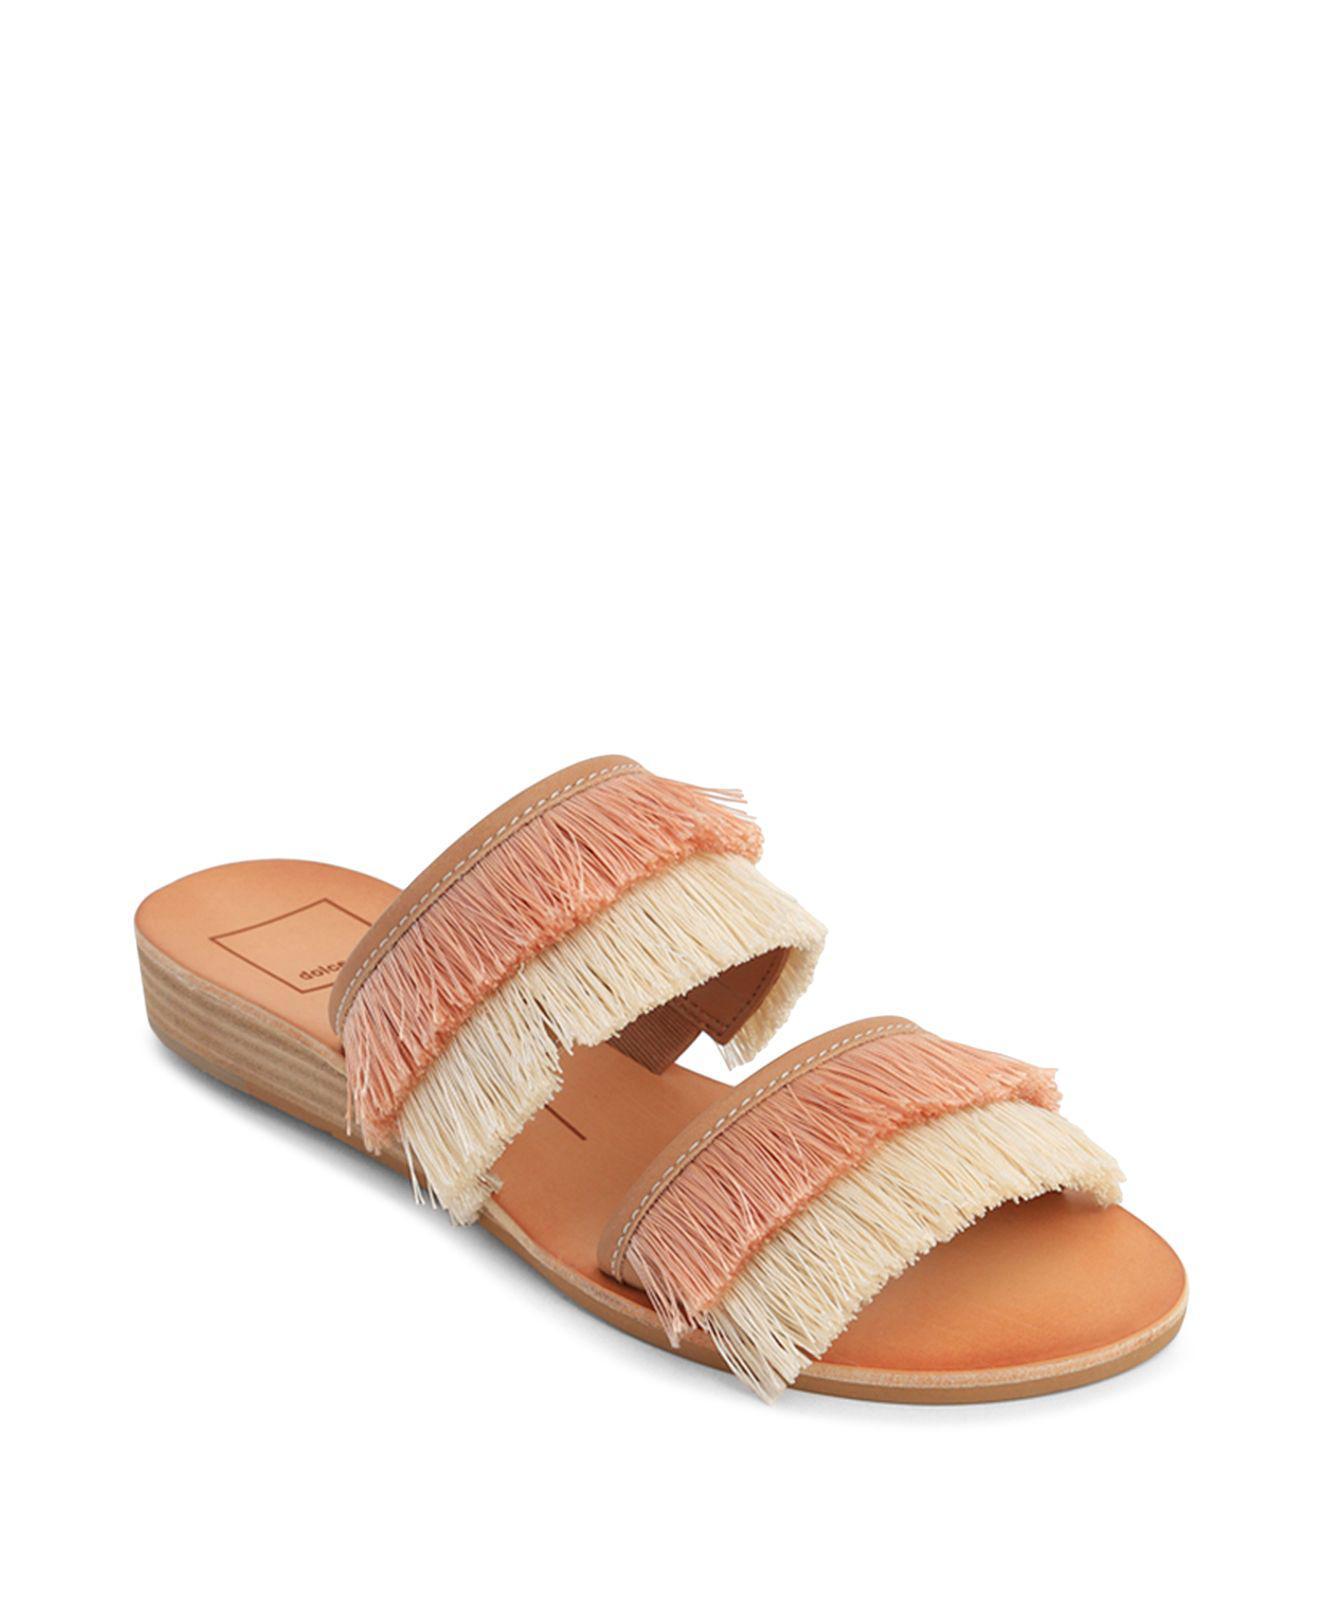 Dolce Vita Women's Haya Fringe Two Band Demi Wedge Slide Sandals IdD2jmQwfA